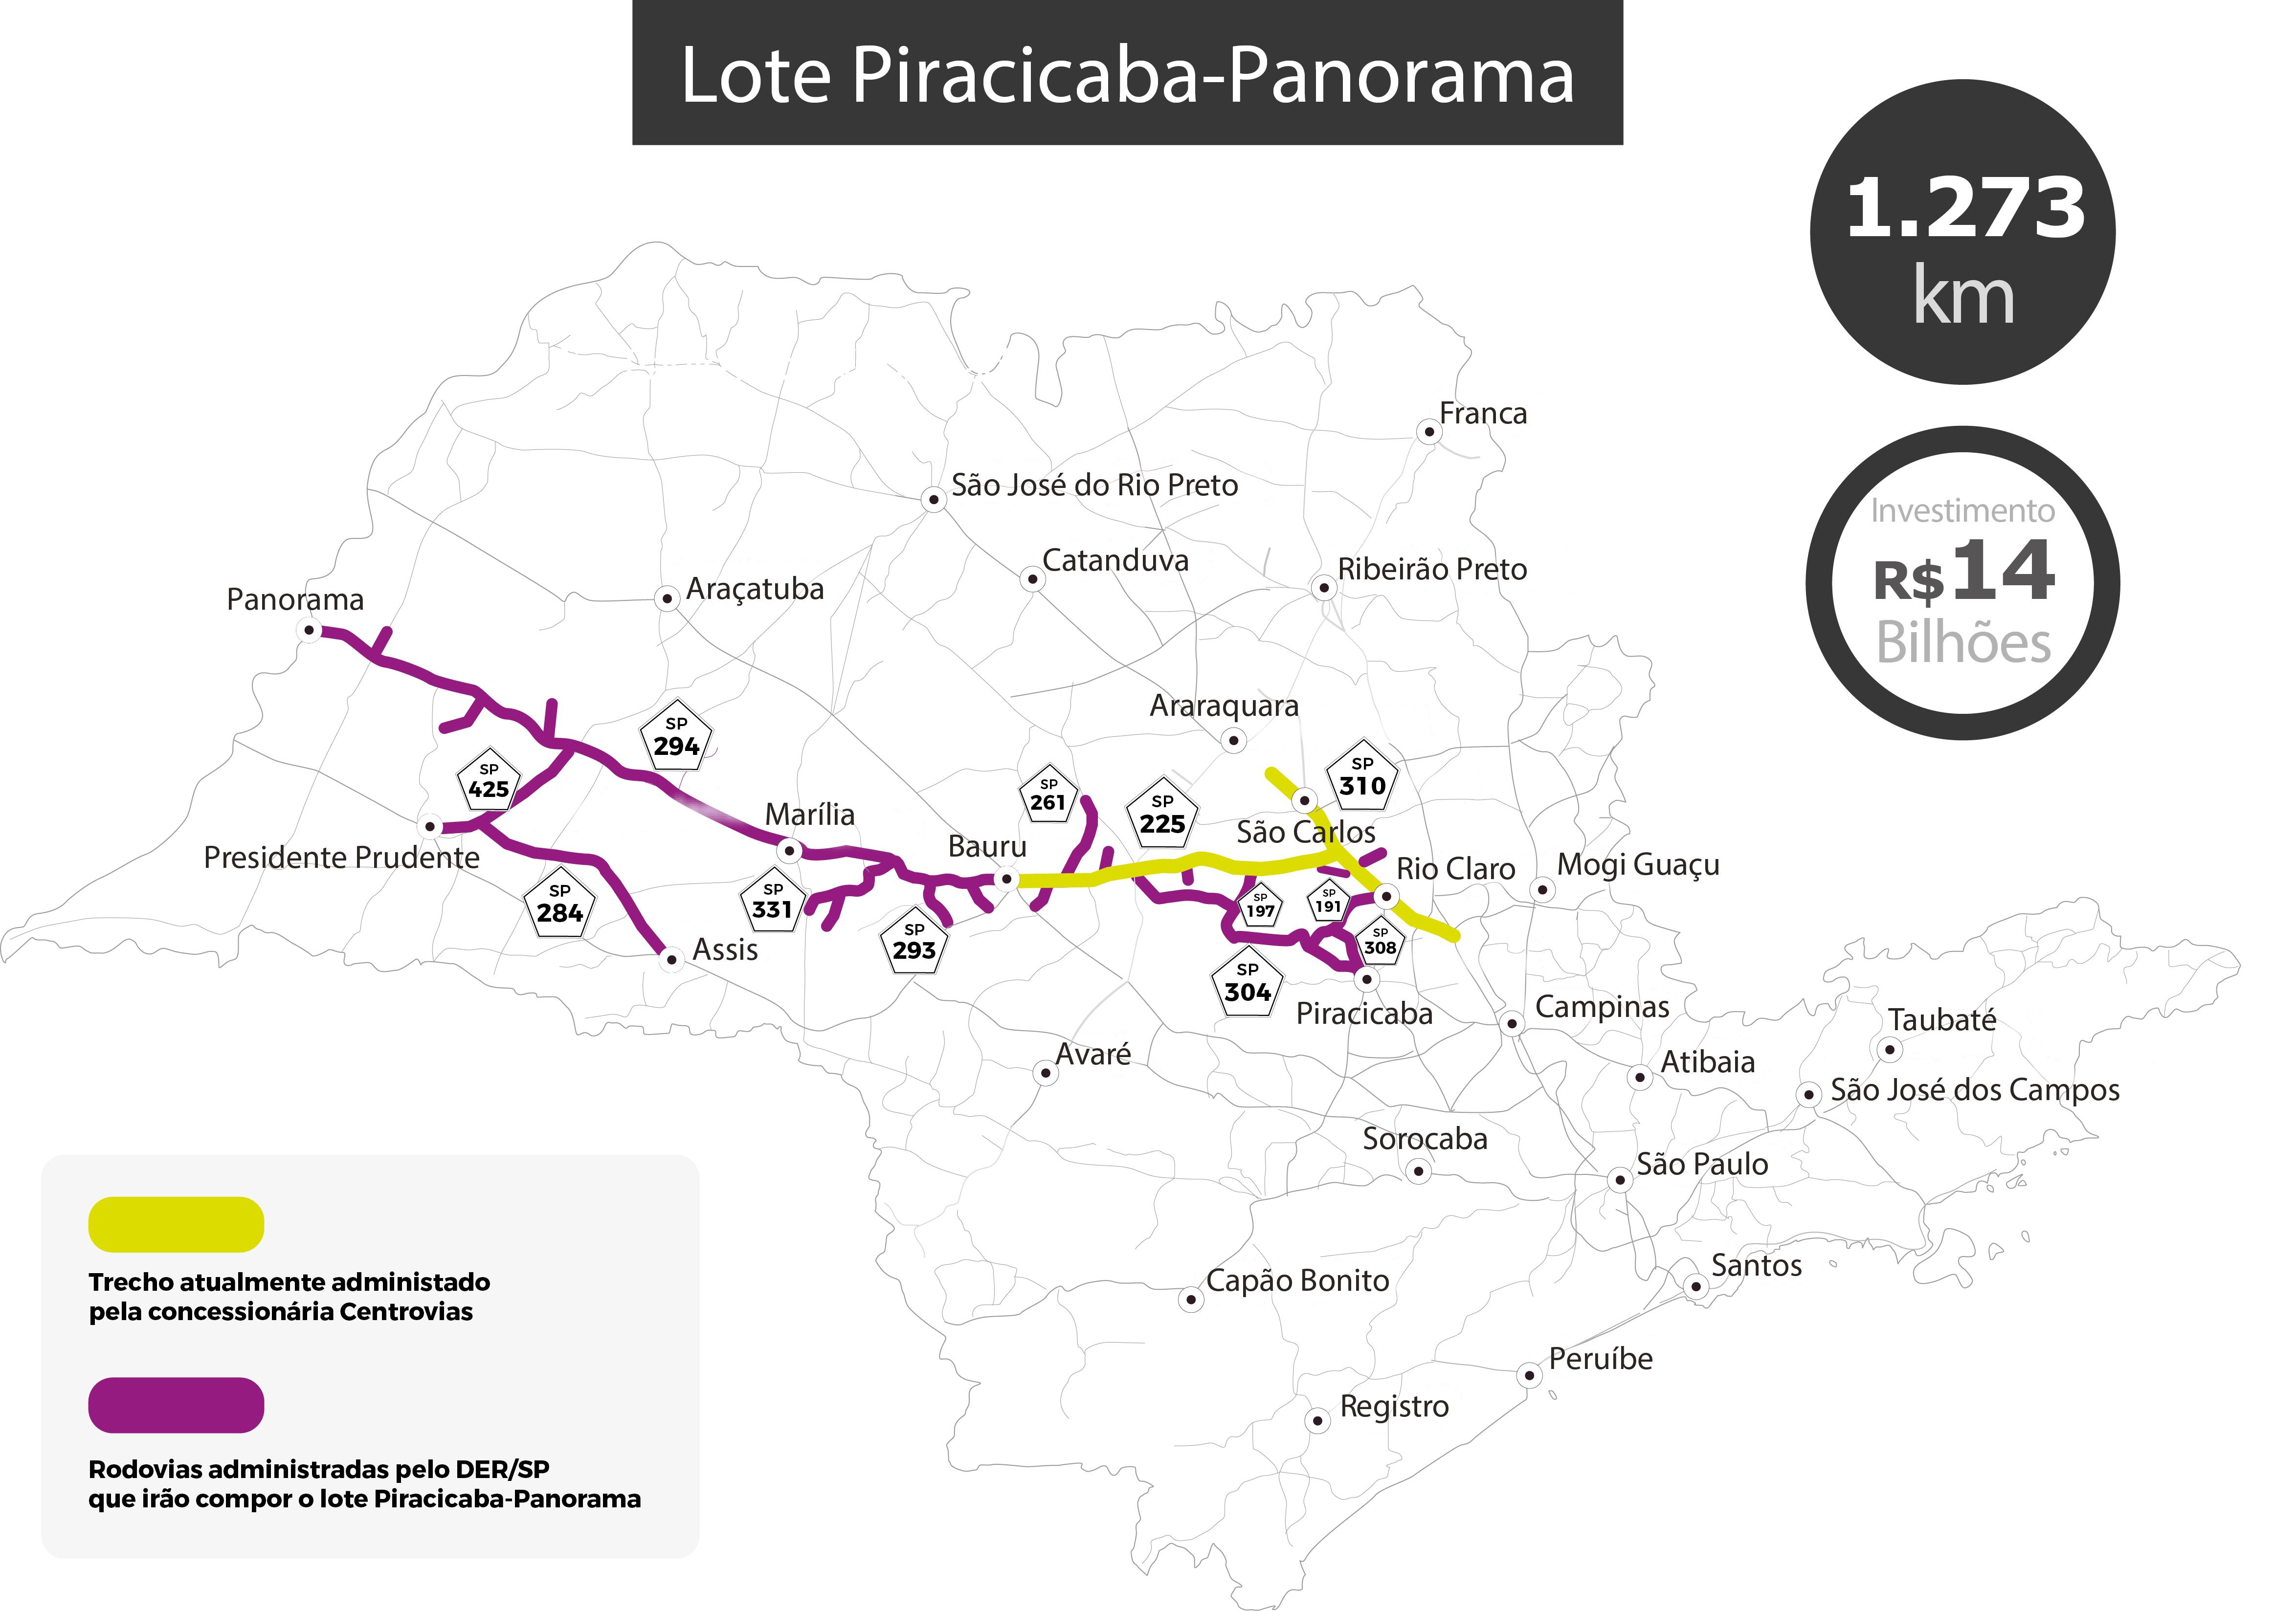 Lote Piracicaba - Panorama.jpg